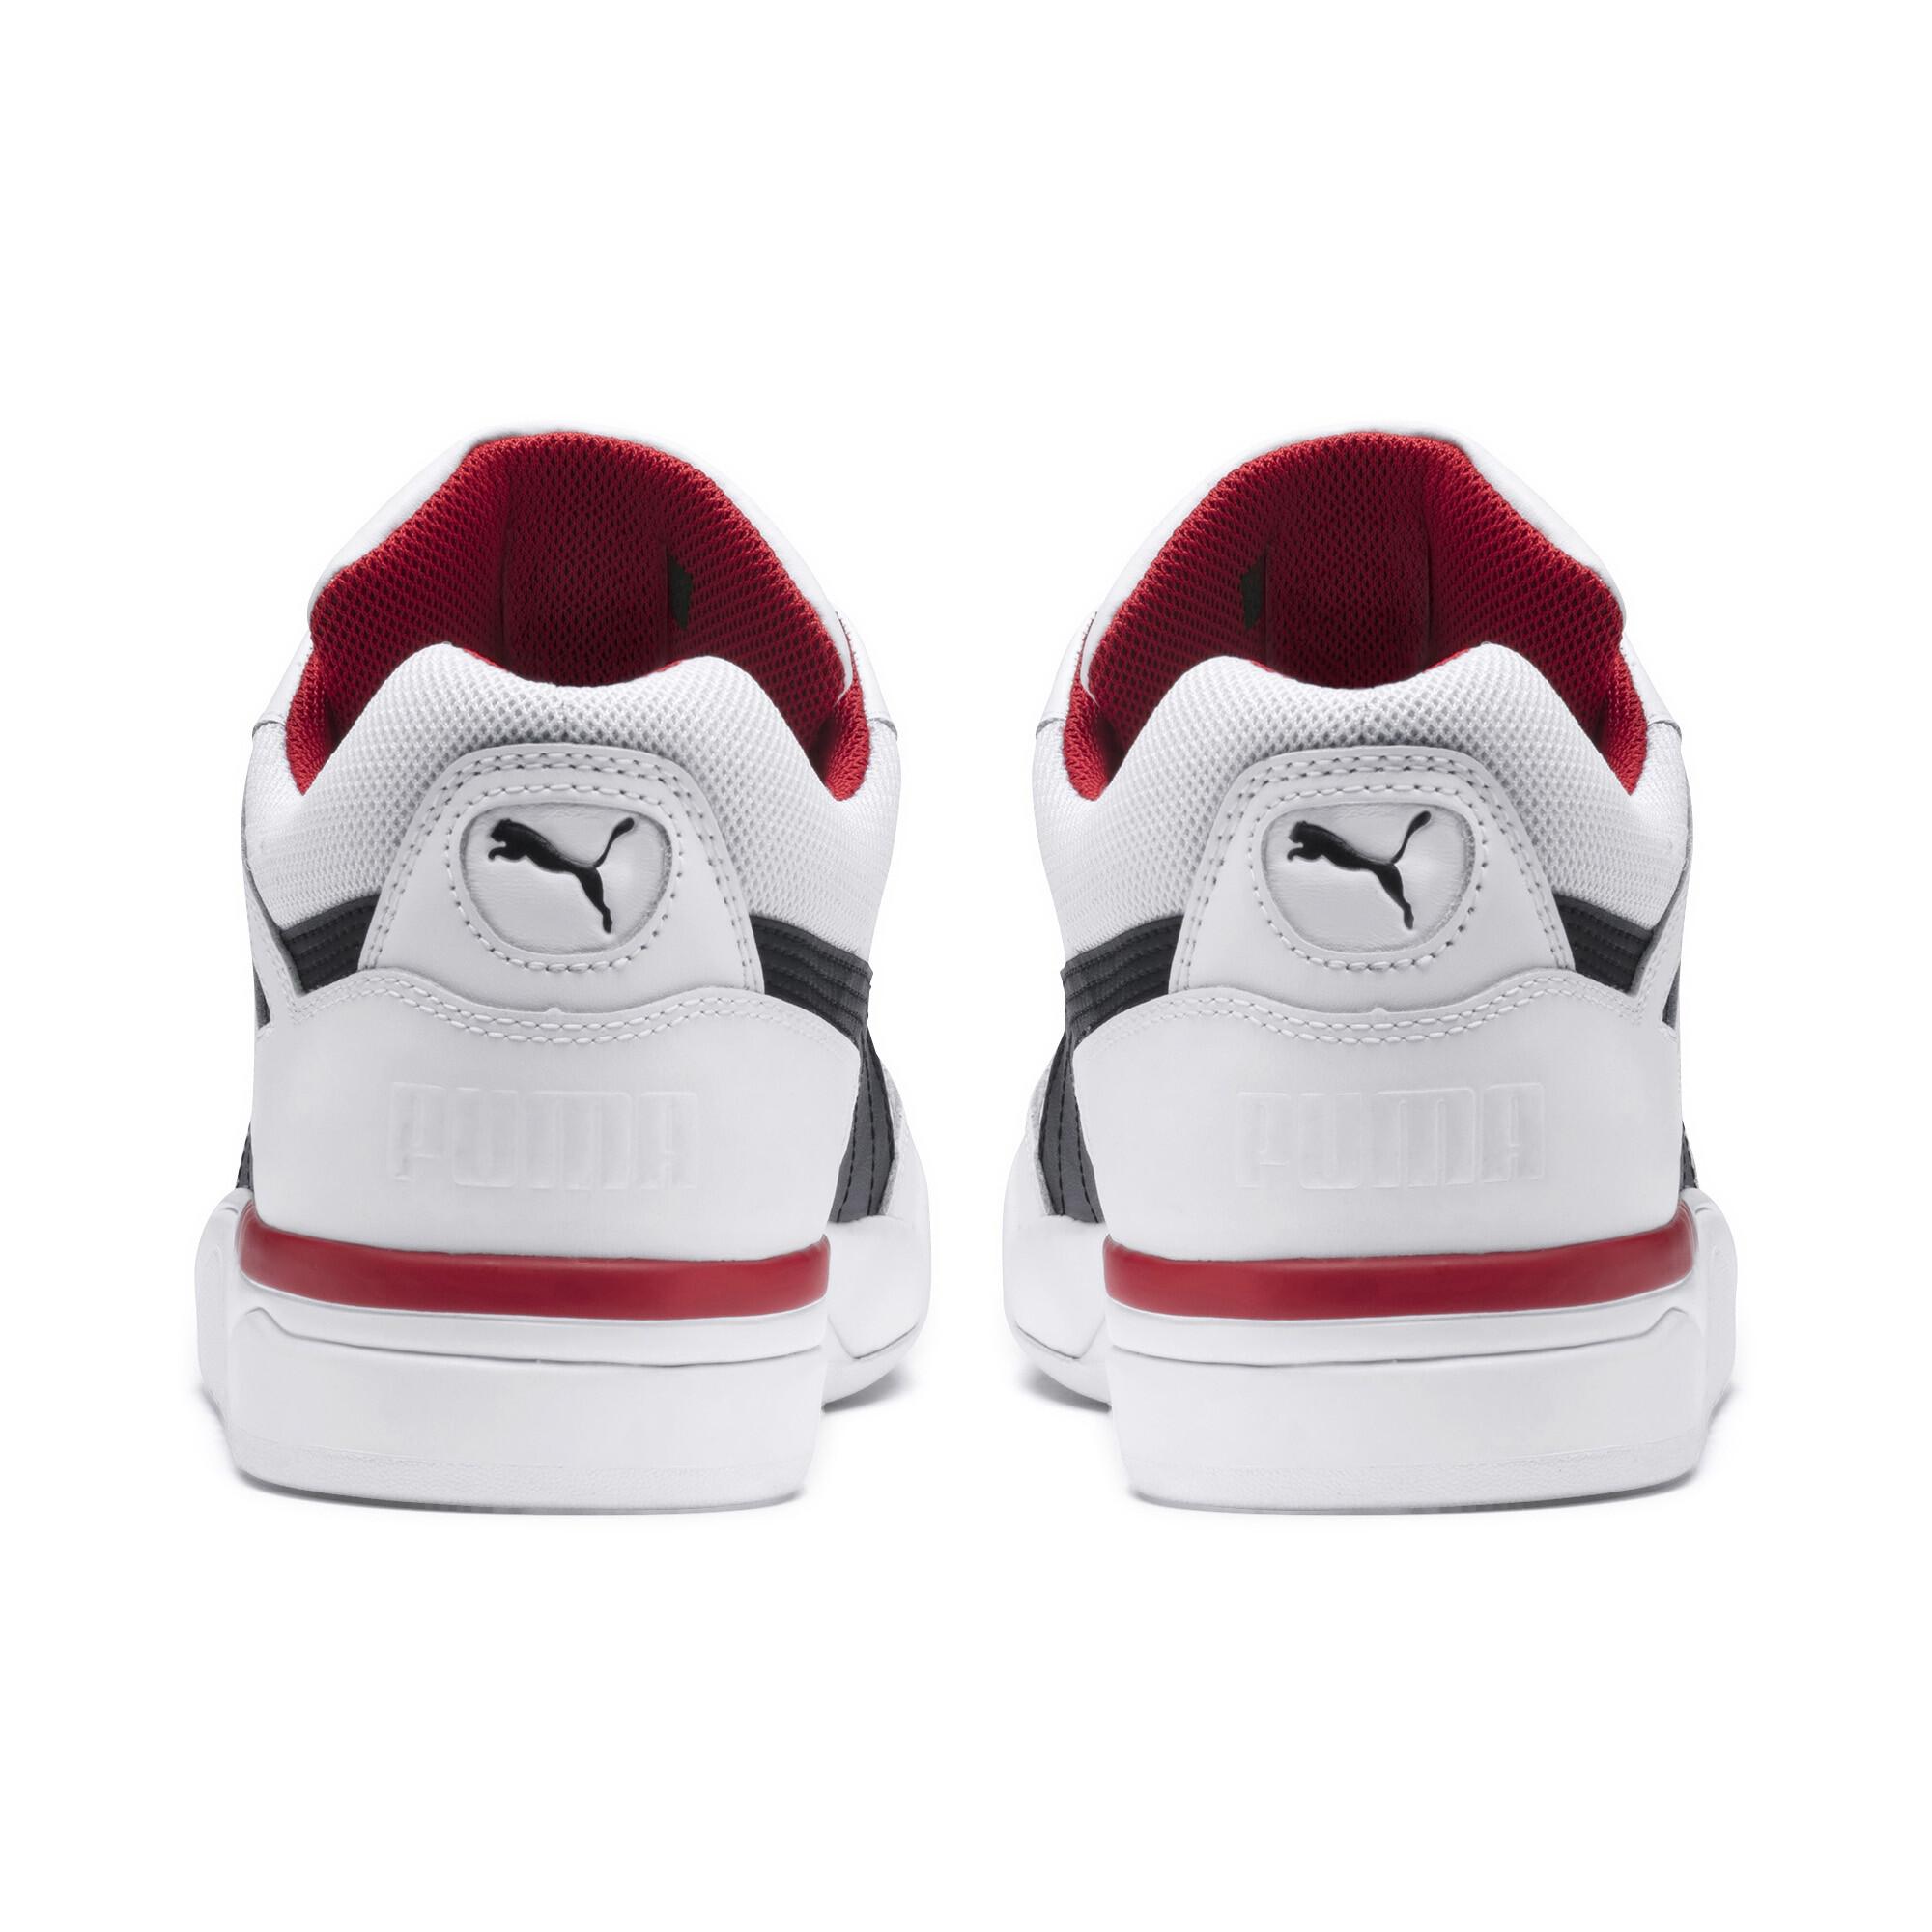 Indexbild 15 - PUMA Palace Guard Sneaker Unisex Schuhe Sport Classics Neu